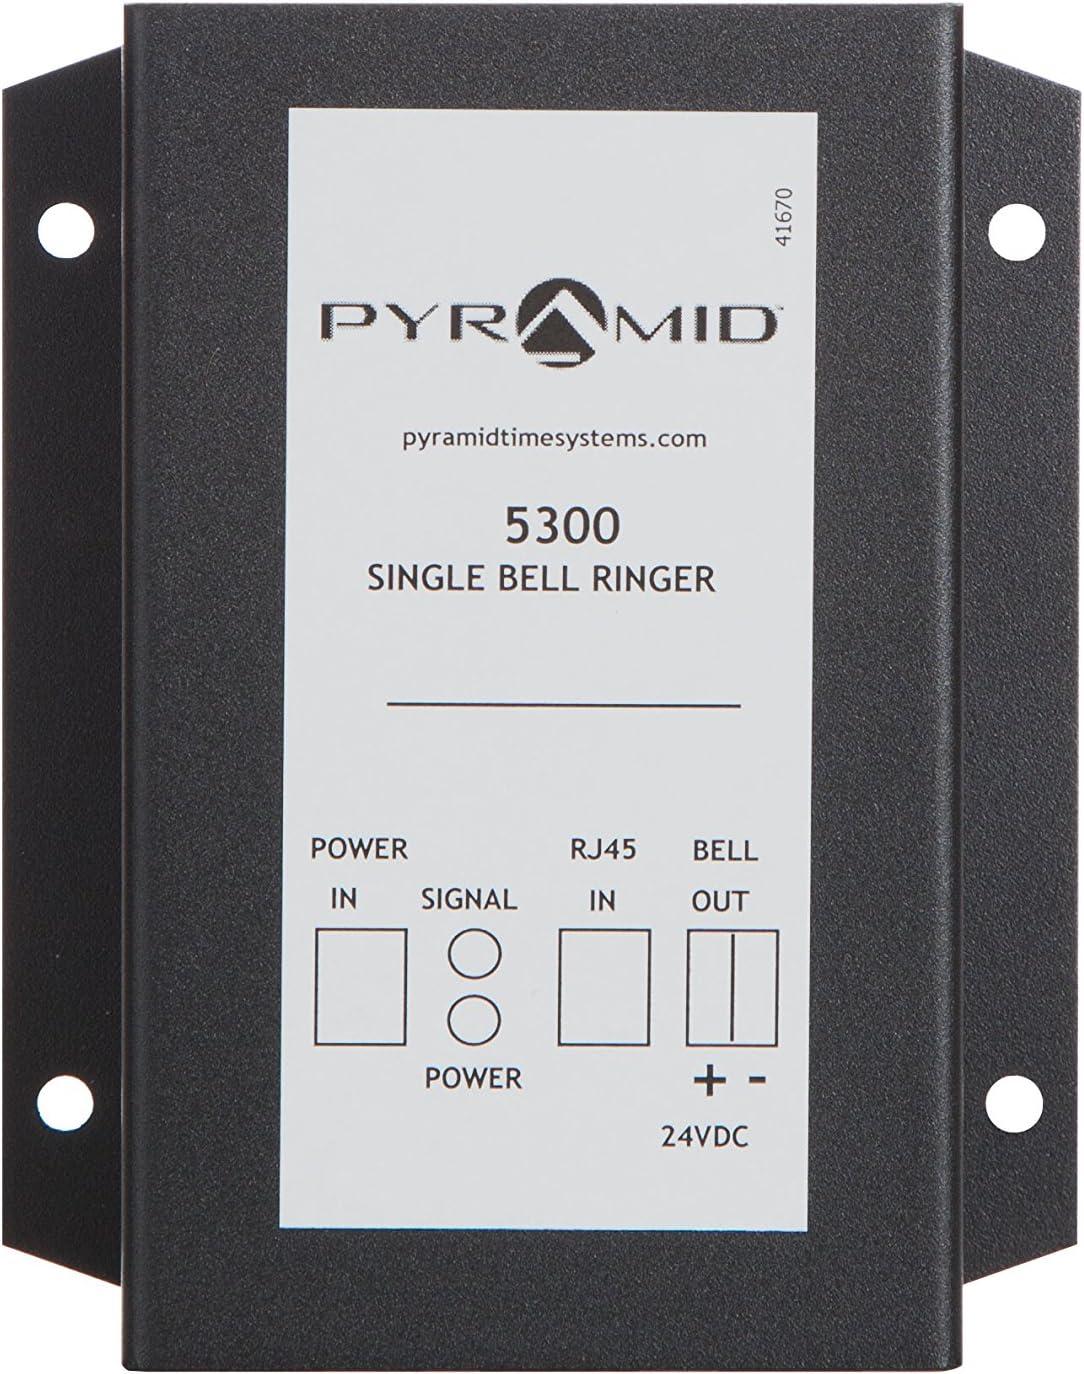 Pyramid 24 Volt Single Zone Bell Ringer (5300)